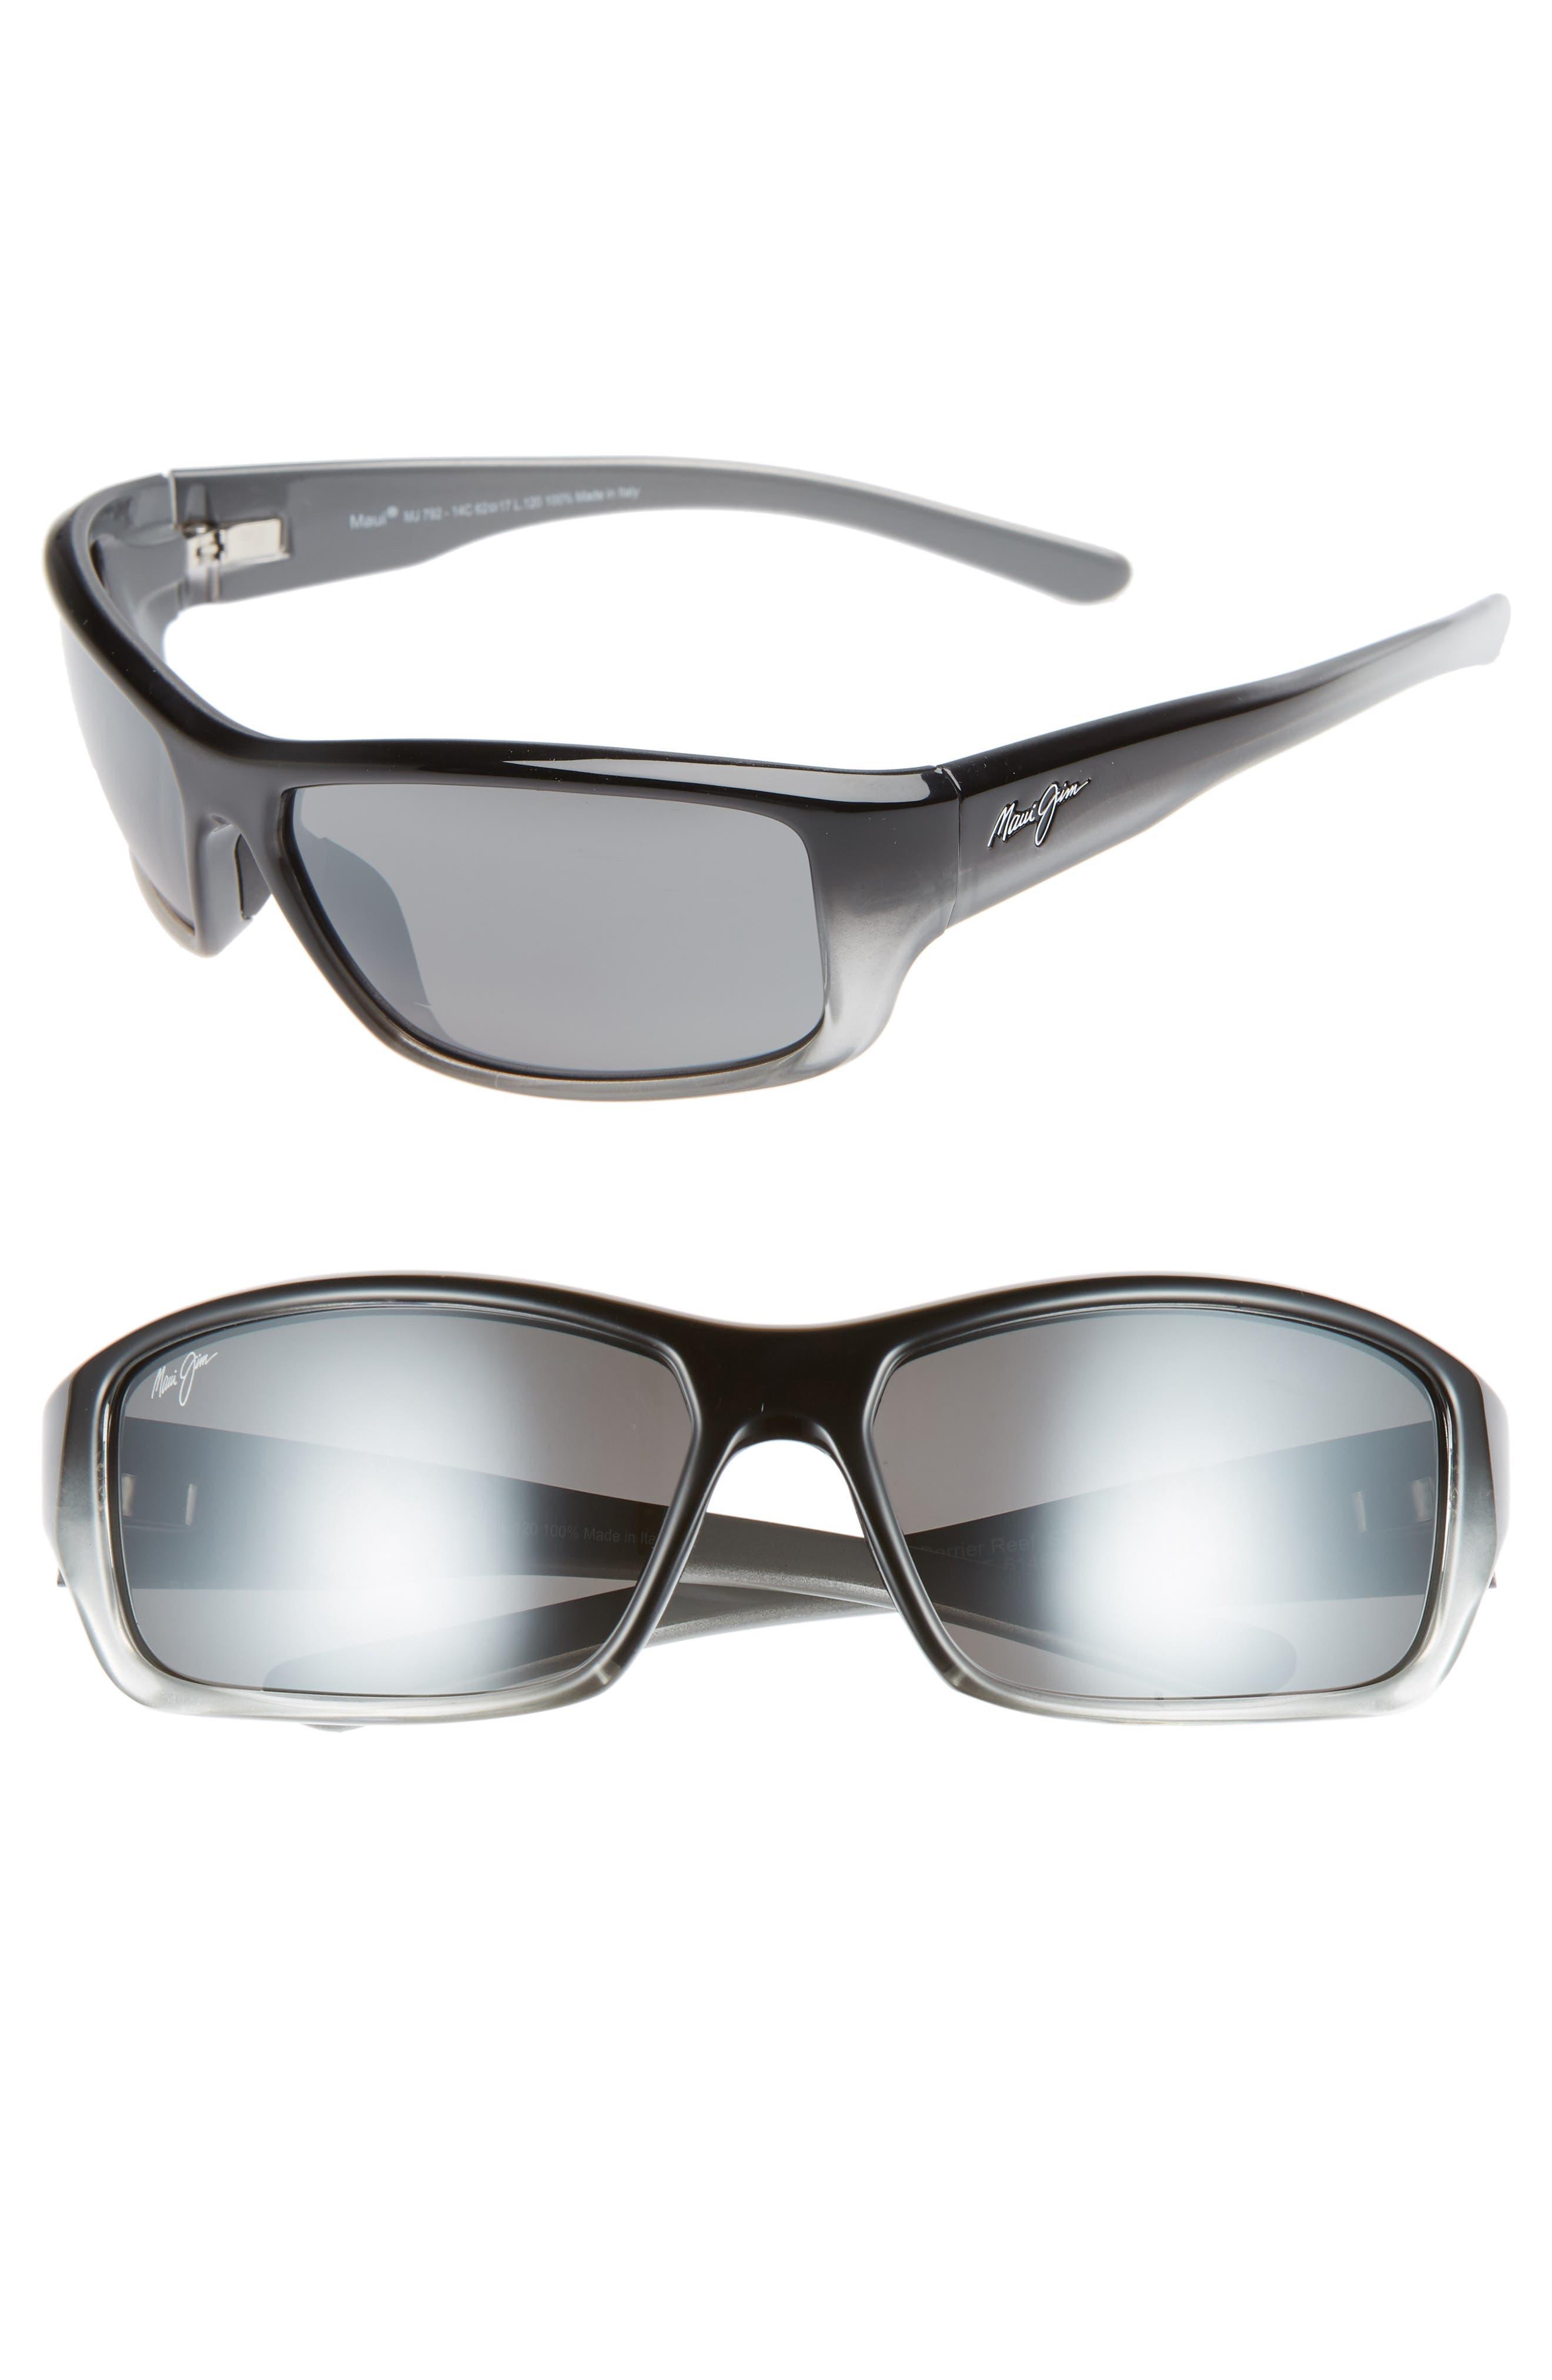 Maui Jim Barrier Reef 62Mm Polarizedplus2 Sunglasses - Black/ Grey